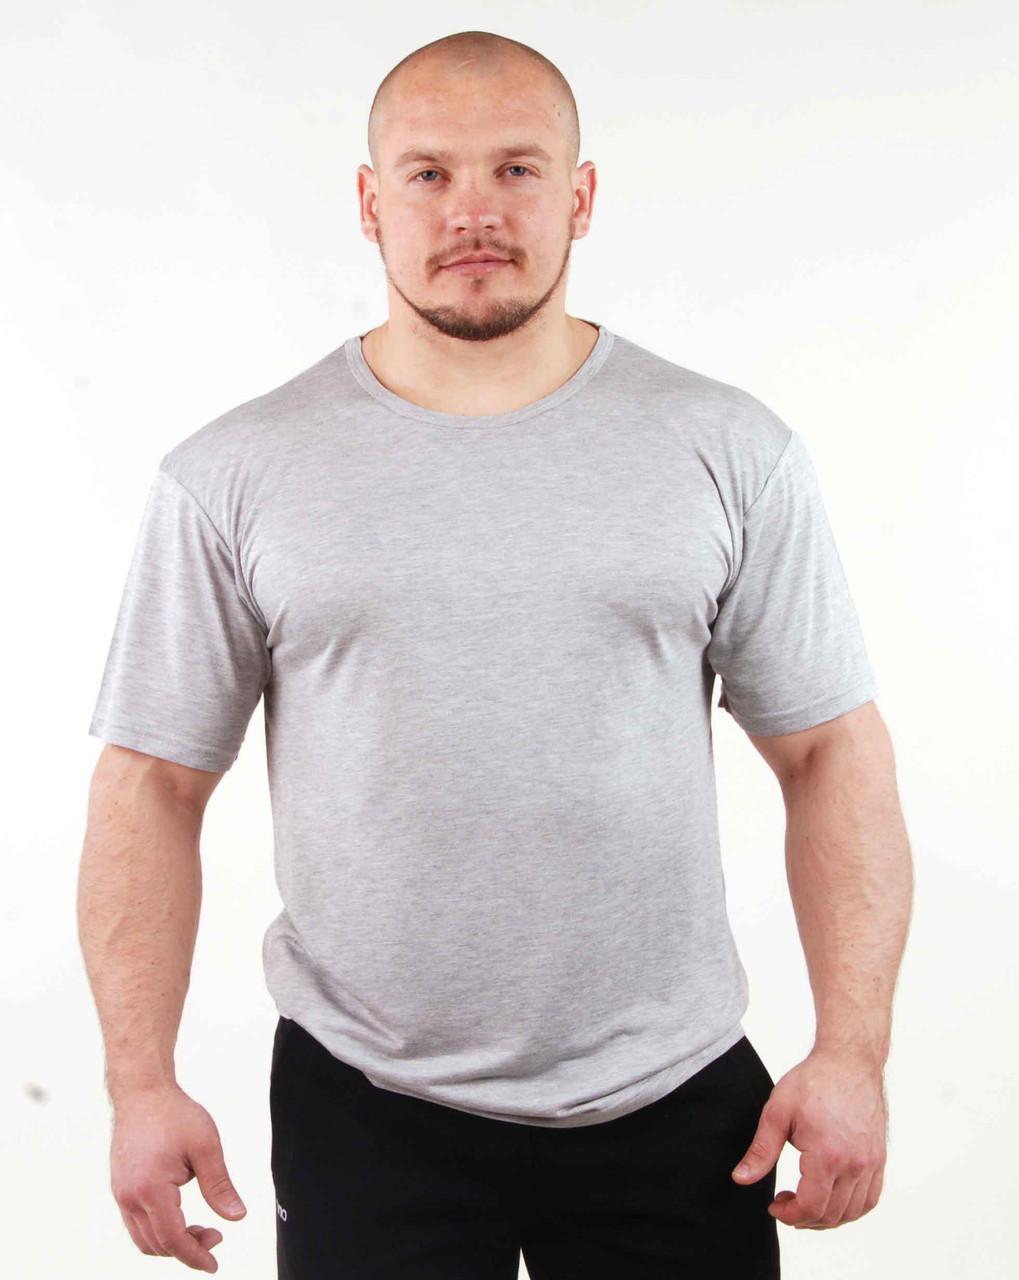 Мужская футболка светло-серая 98